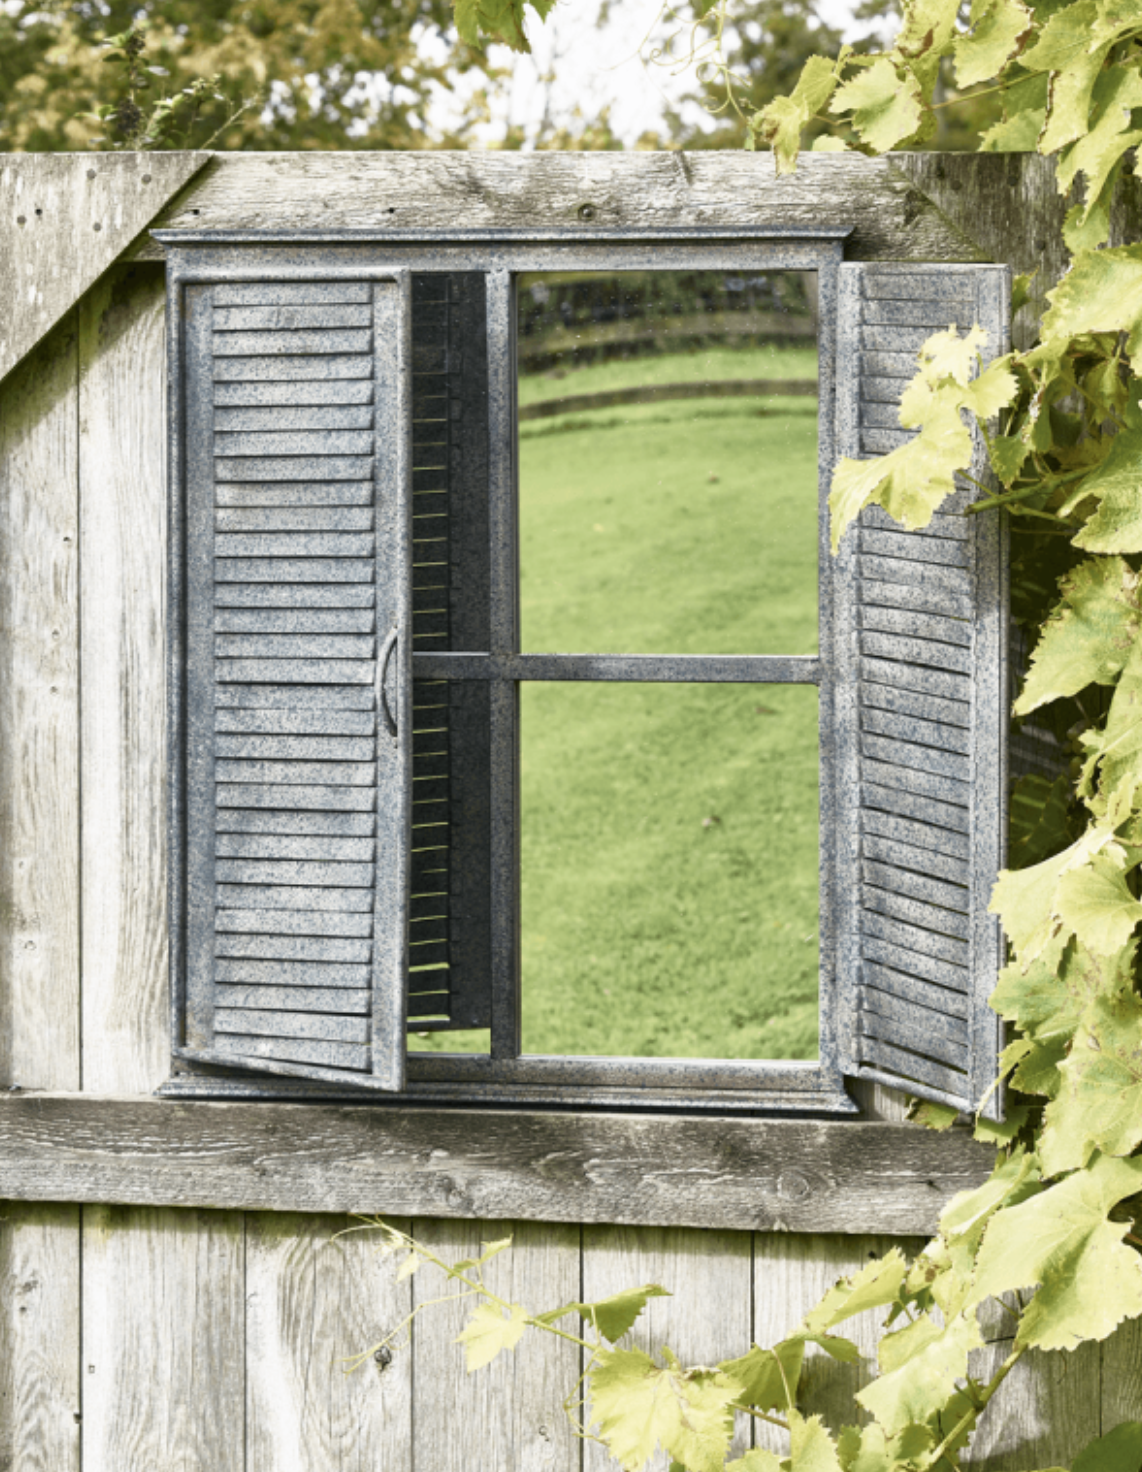 outdoor mirror window with shutter